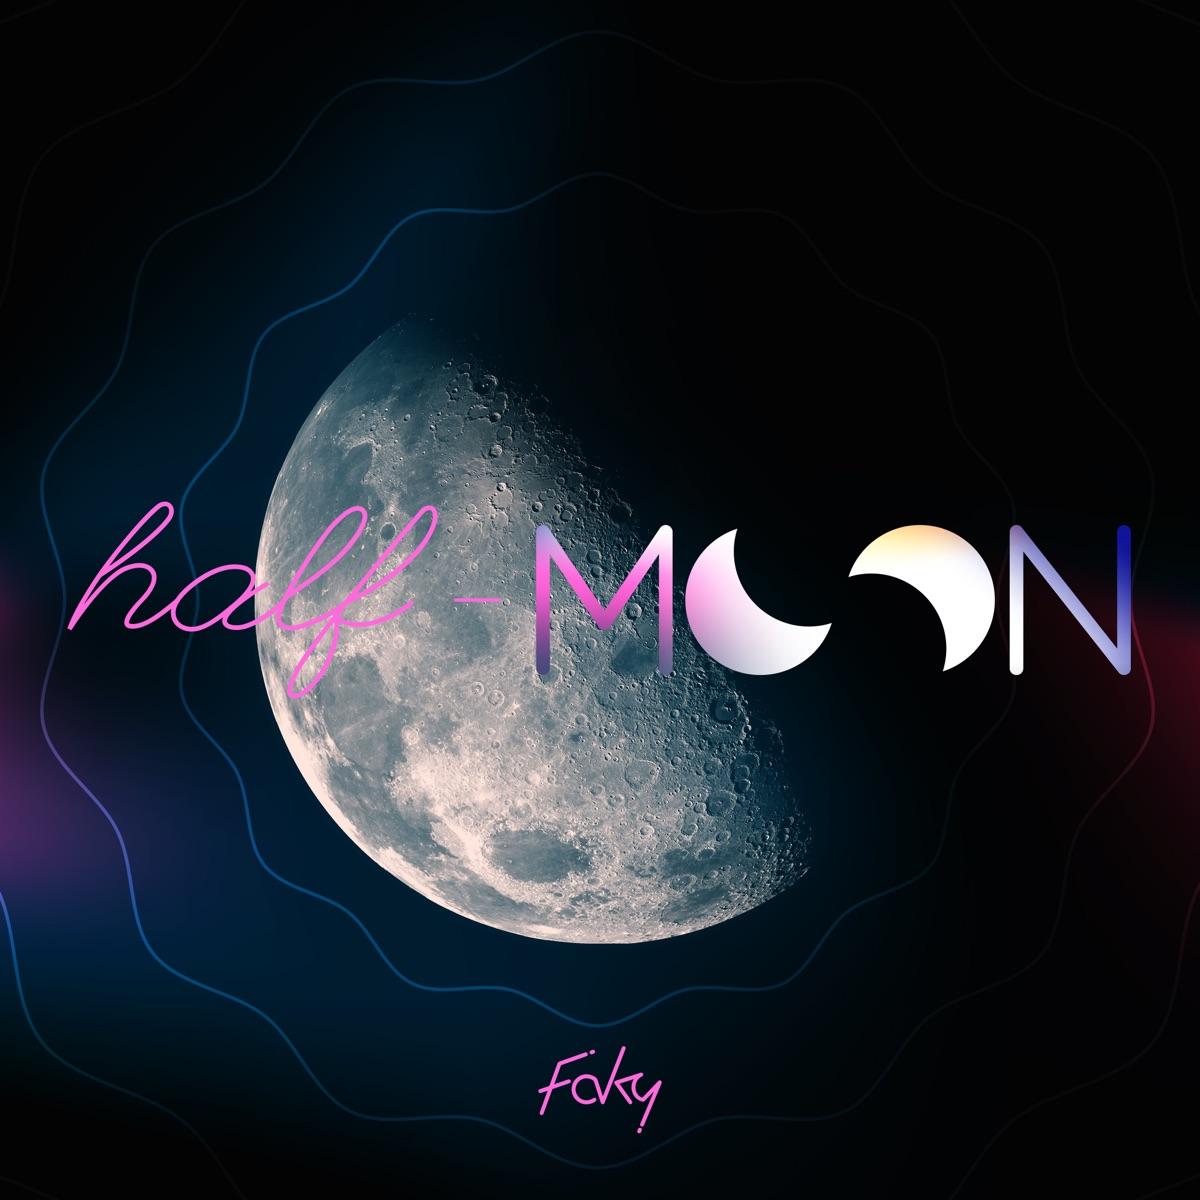 half-moon FAKY 歌詞【歌詞リリ】Lyrical Nonsense